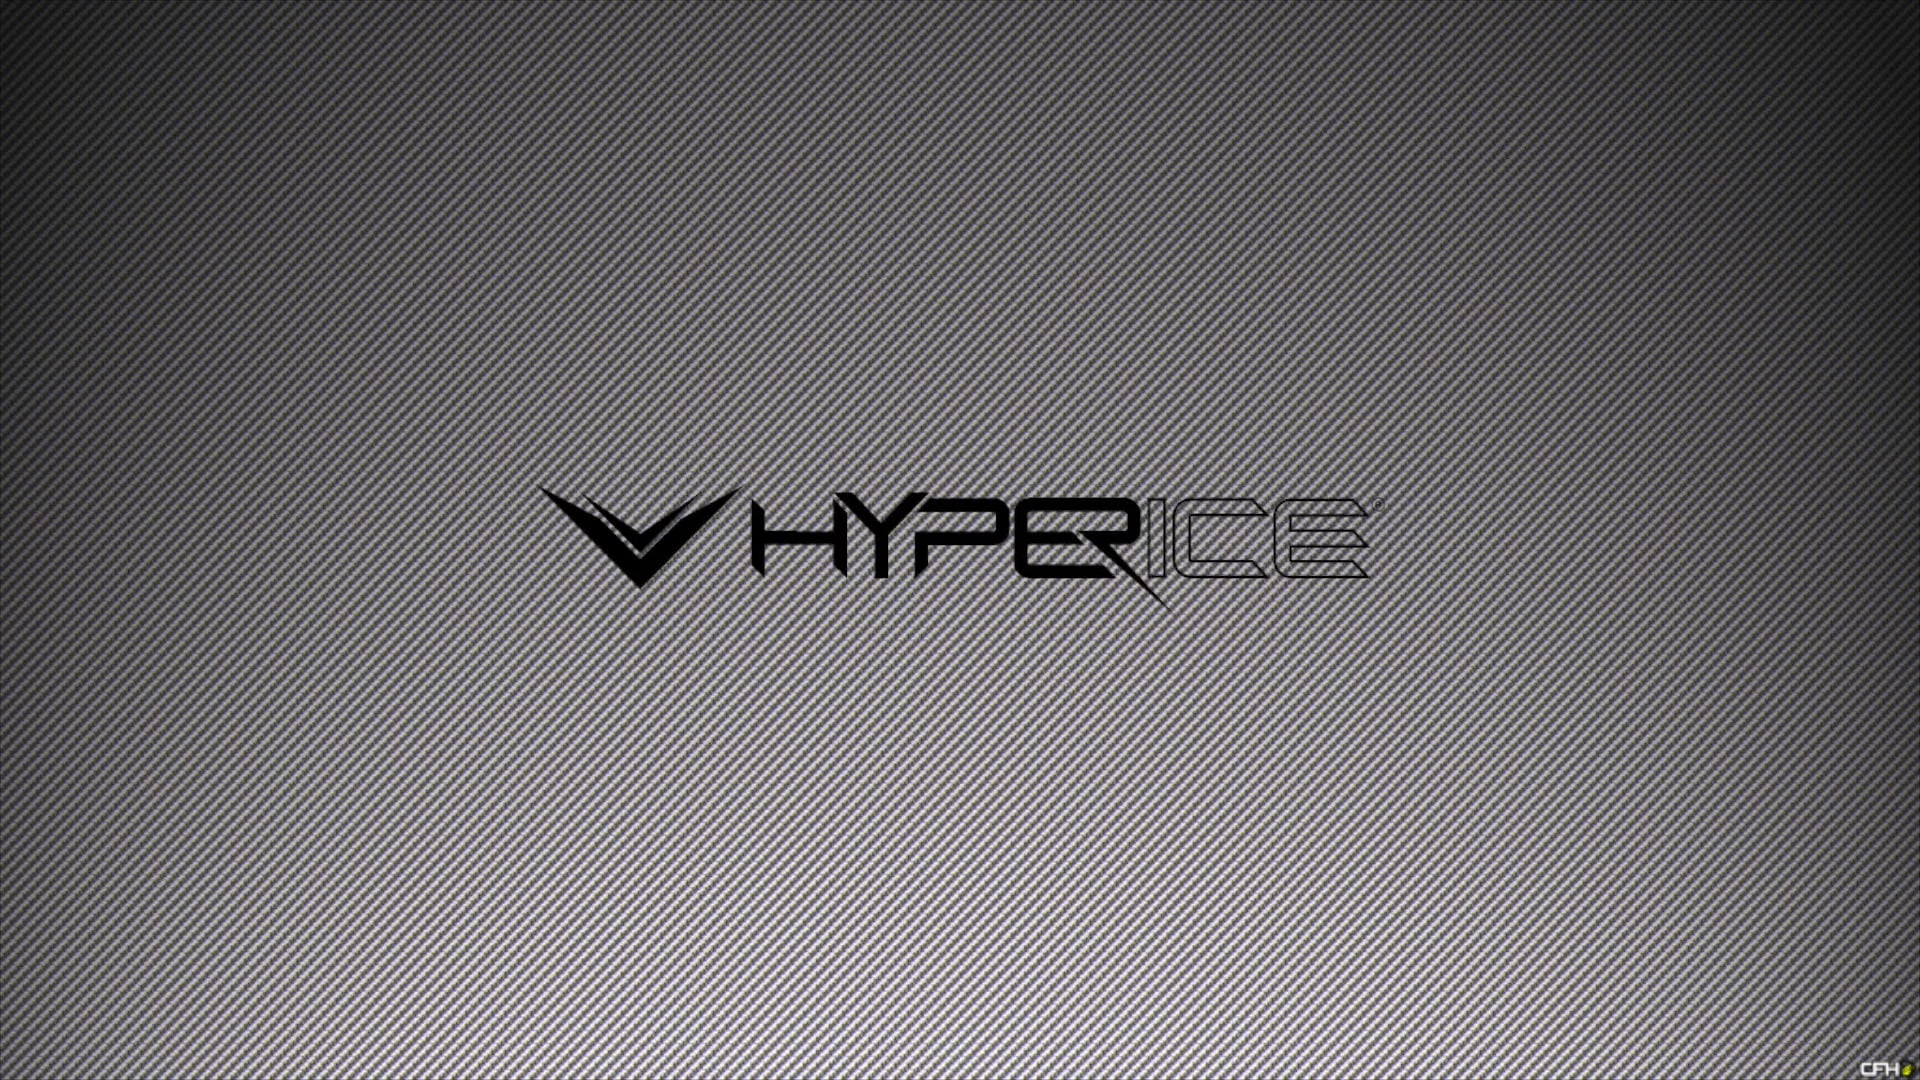 HyperIce BTS